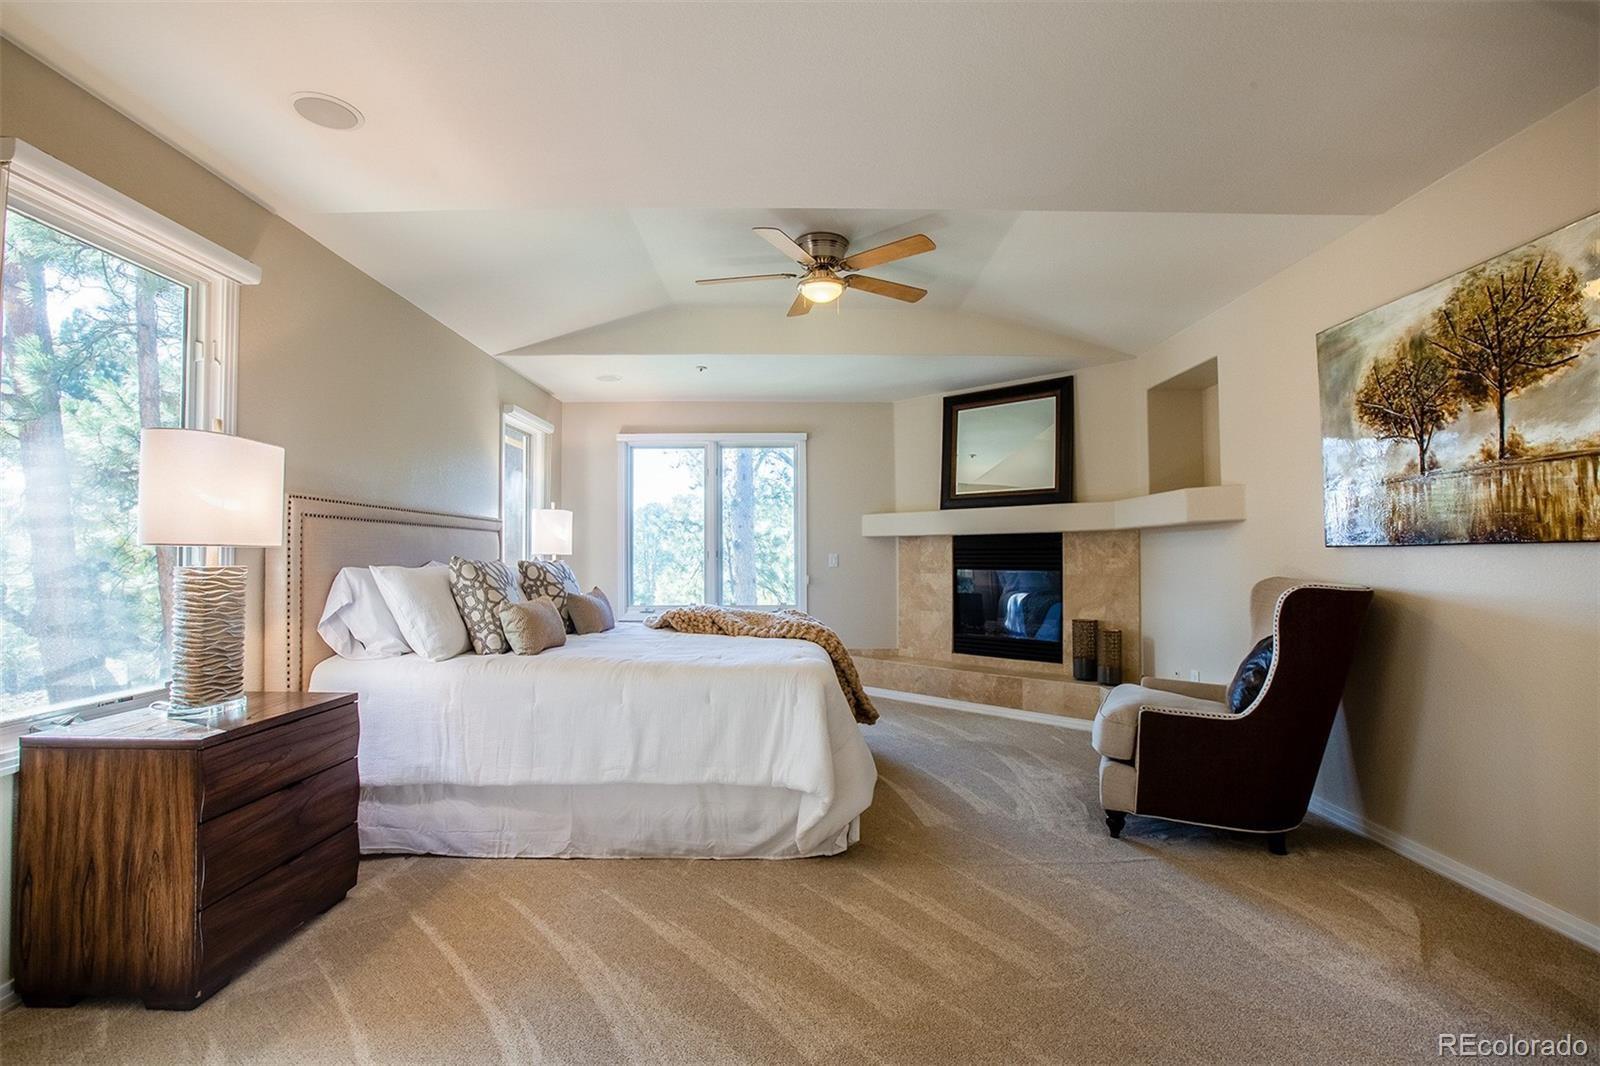 MLS# 7371899 - 14 - 429 Castle Pines Drive, Castle Rock, CO 80108